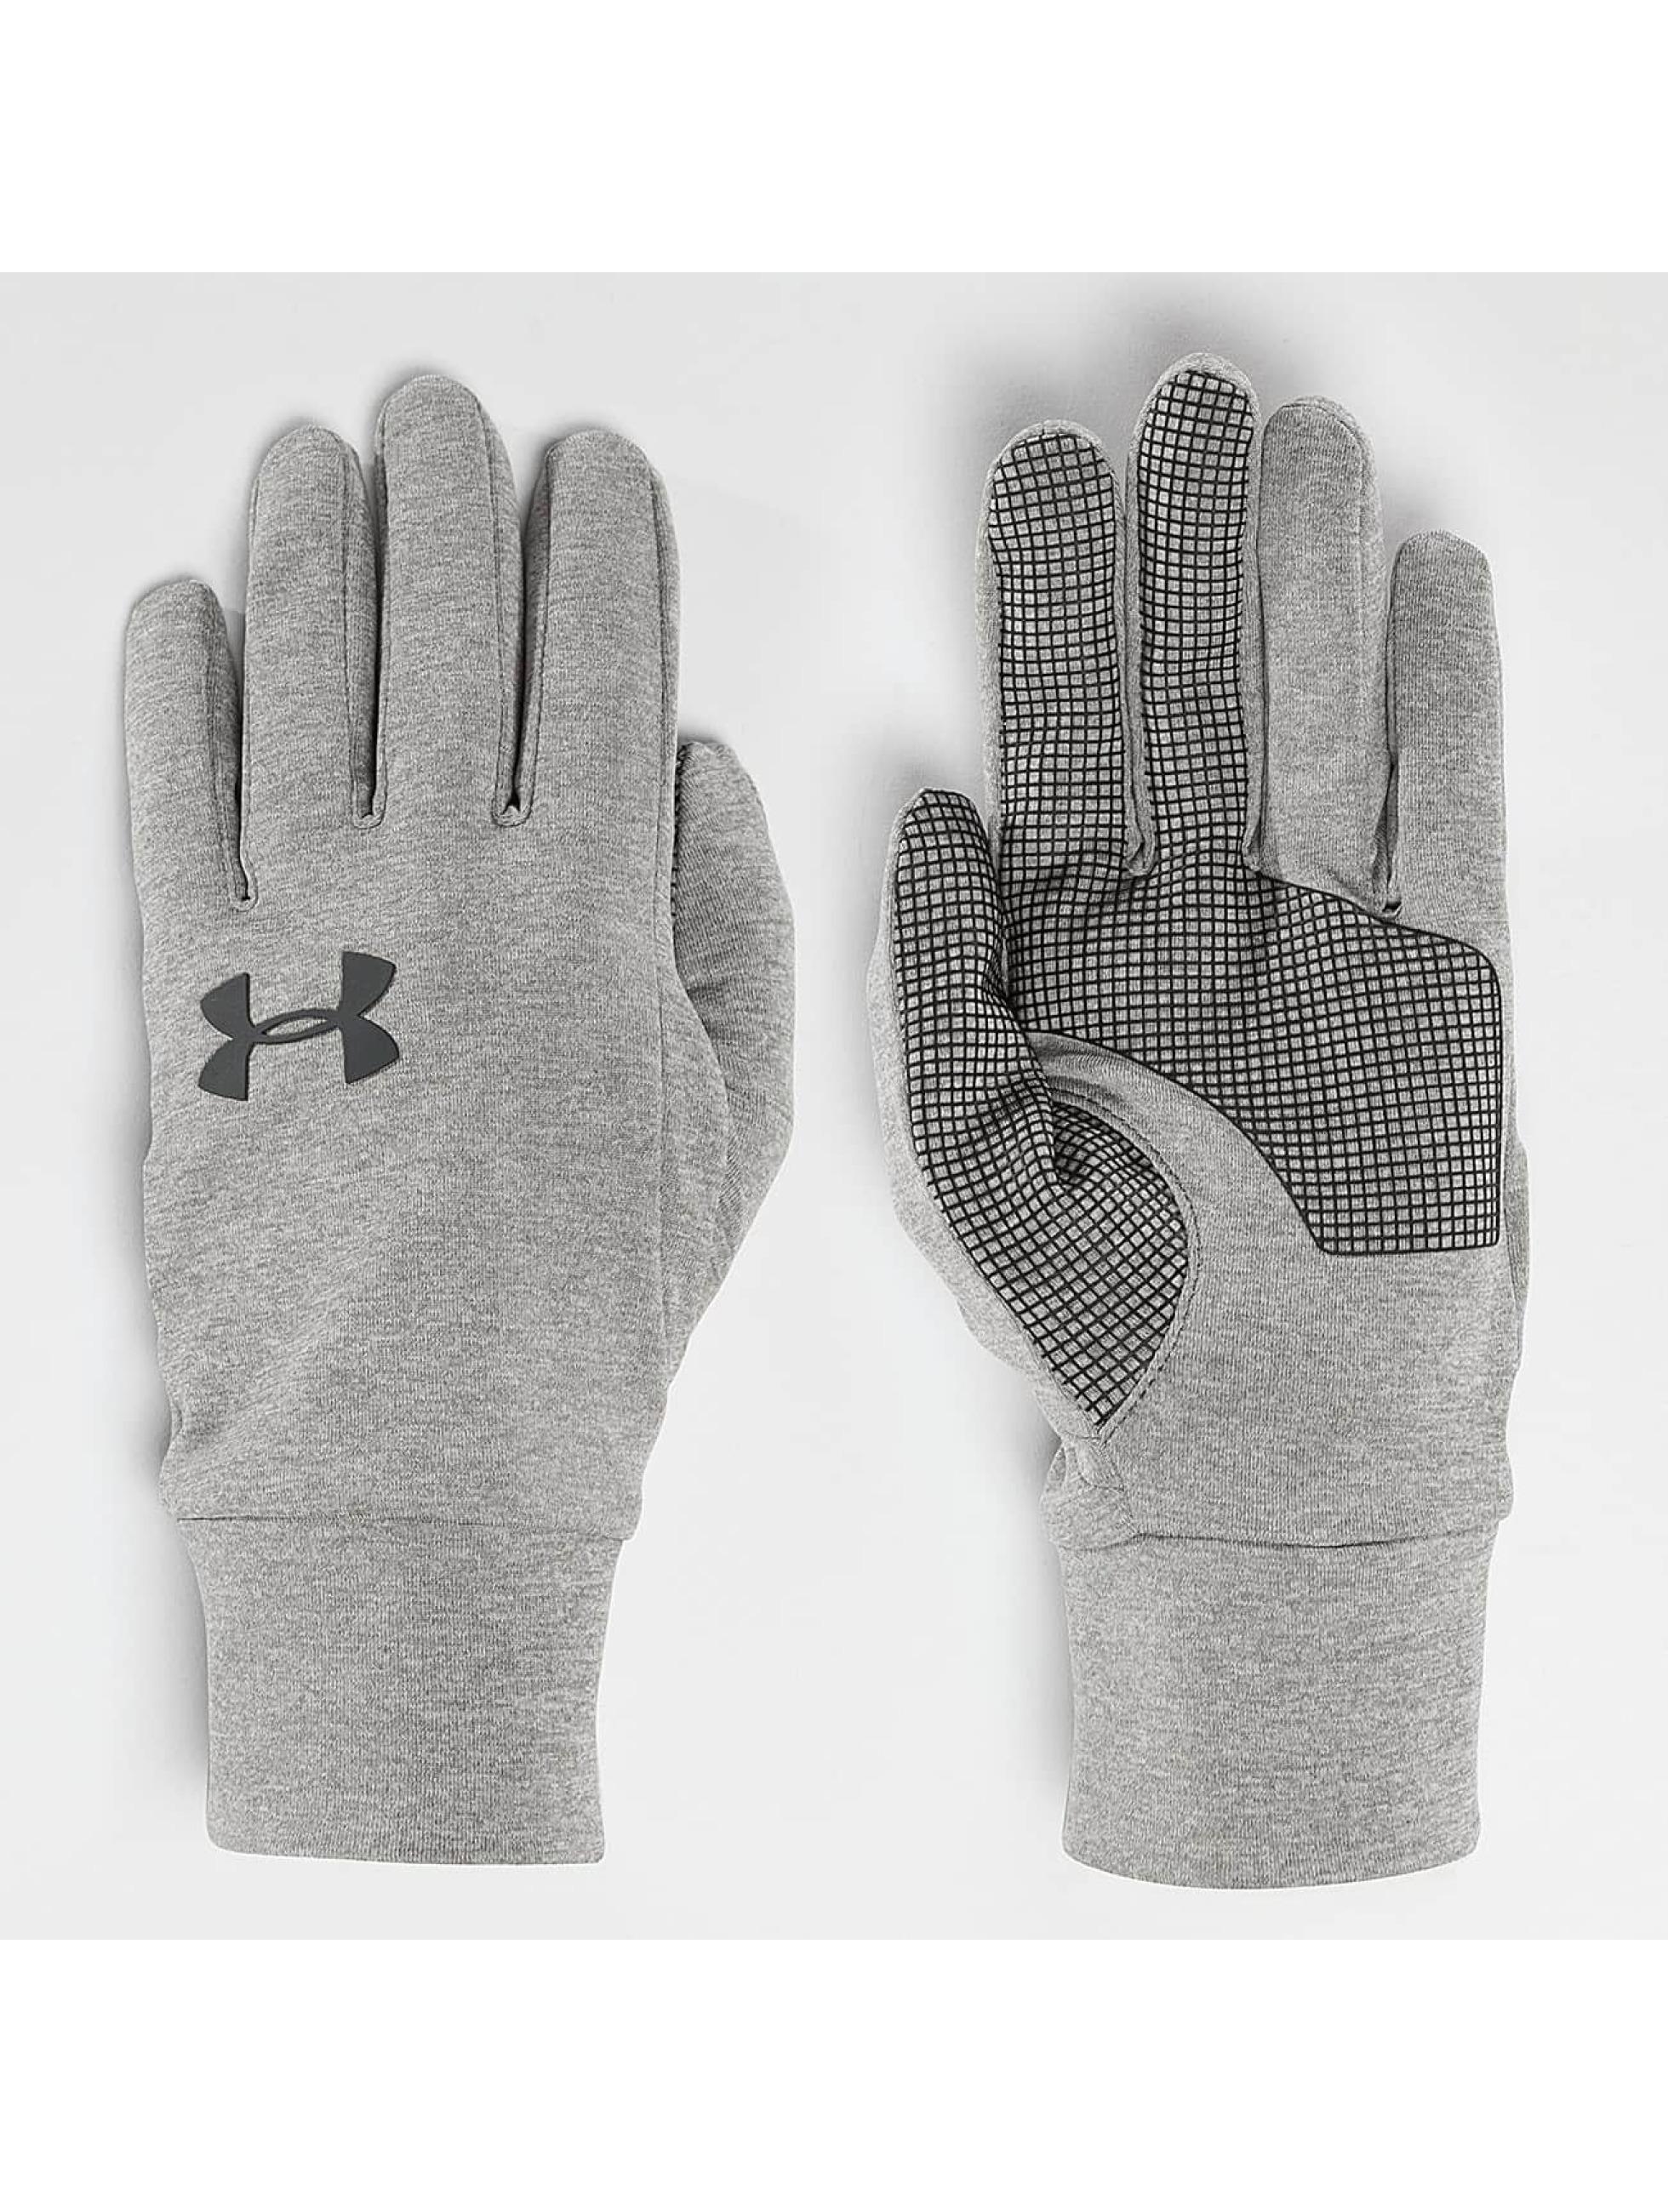 Under Armour Glove Liner gray